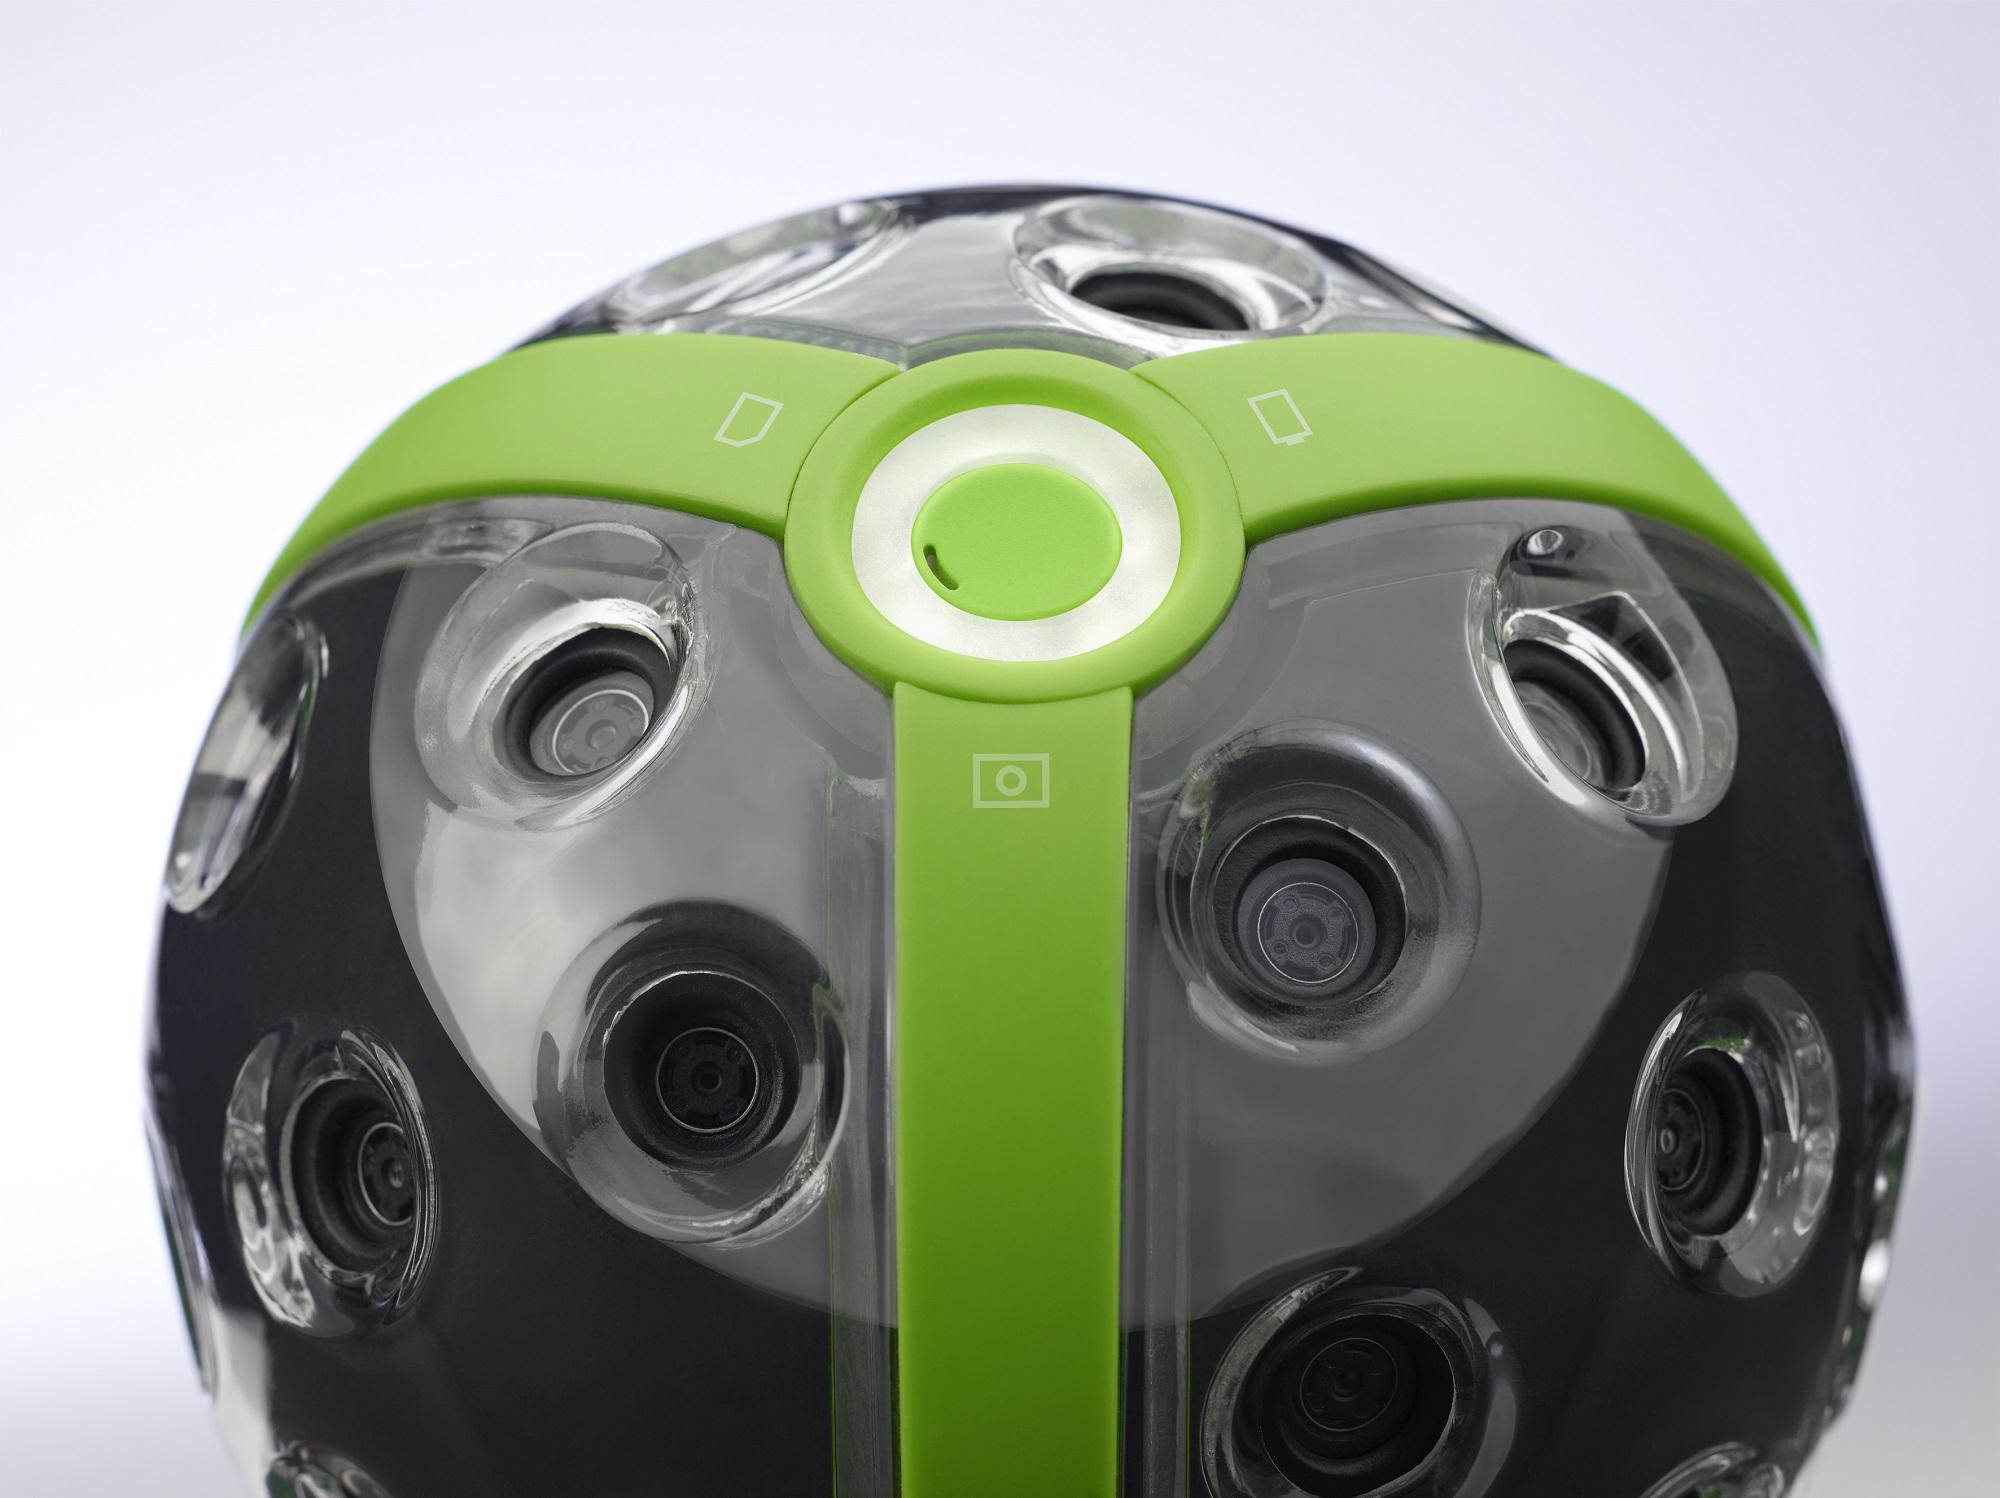 panono ball camera front